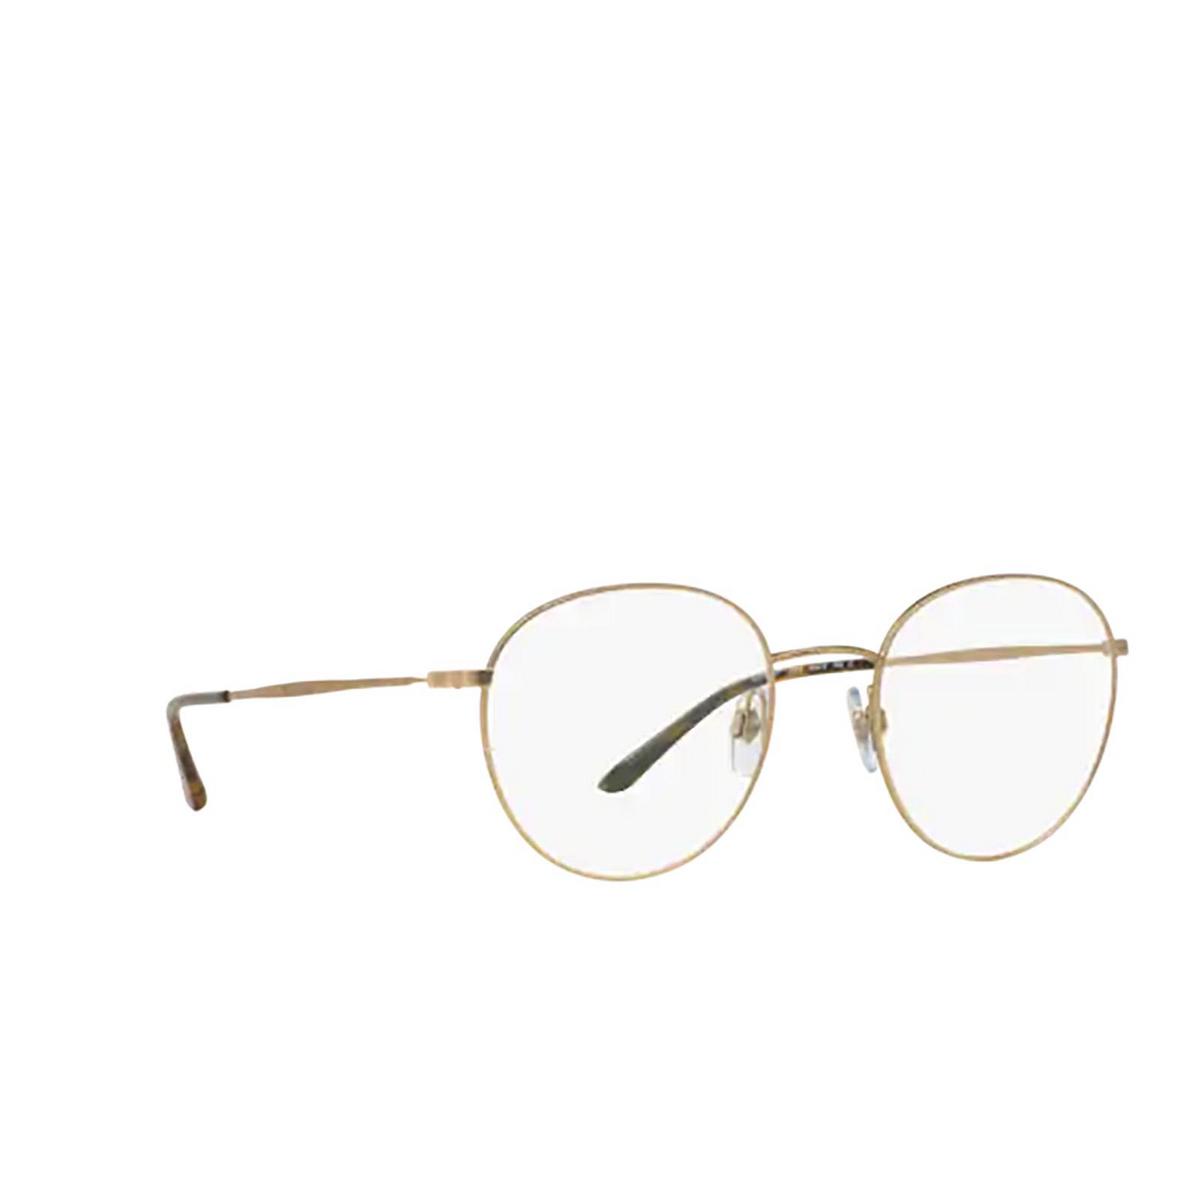 Giorgio Armani® Round Eyeglasses: AR5057 color Matte Pale Gold 3002 - three-quarters view.